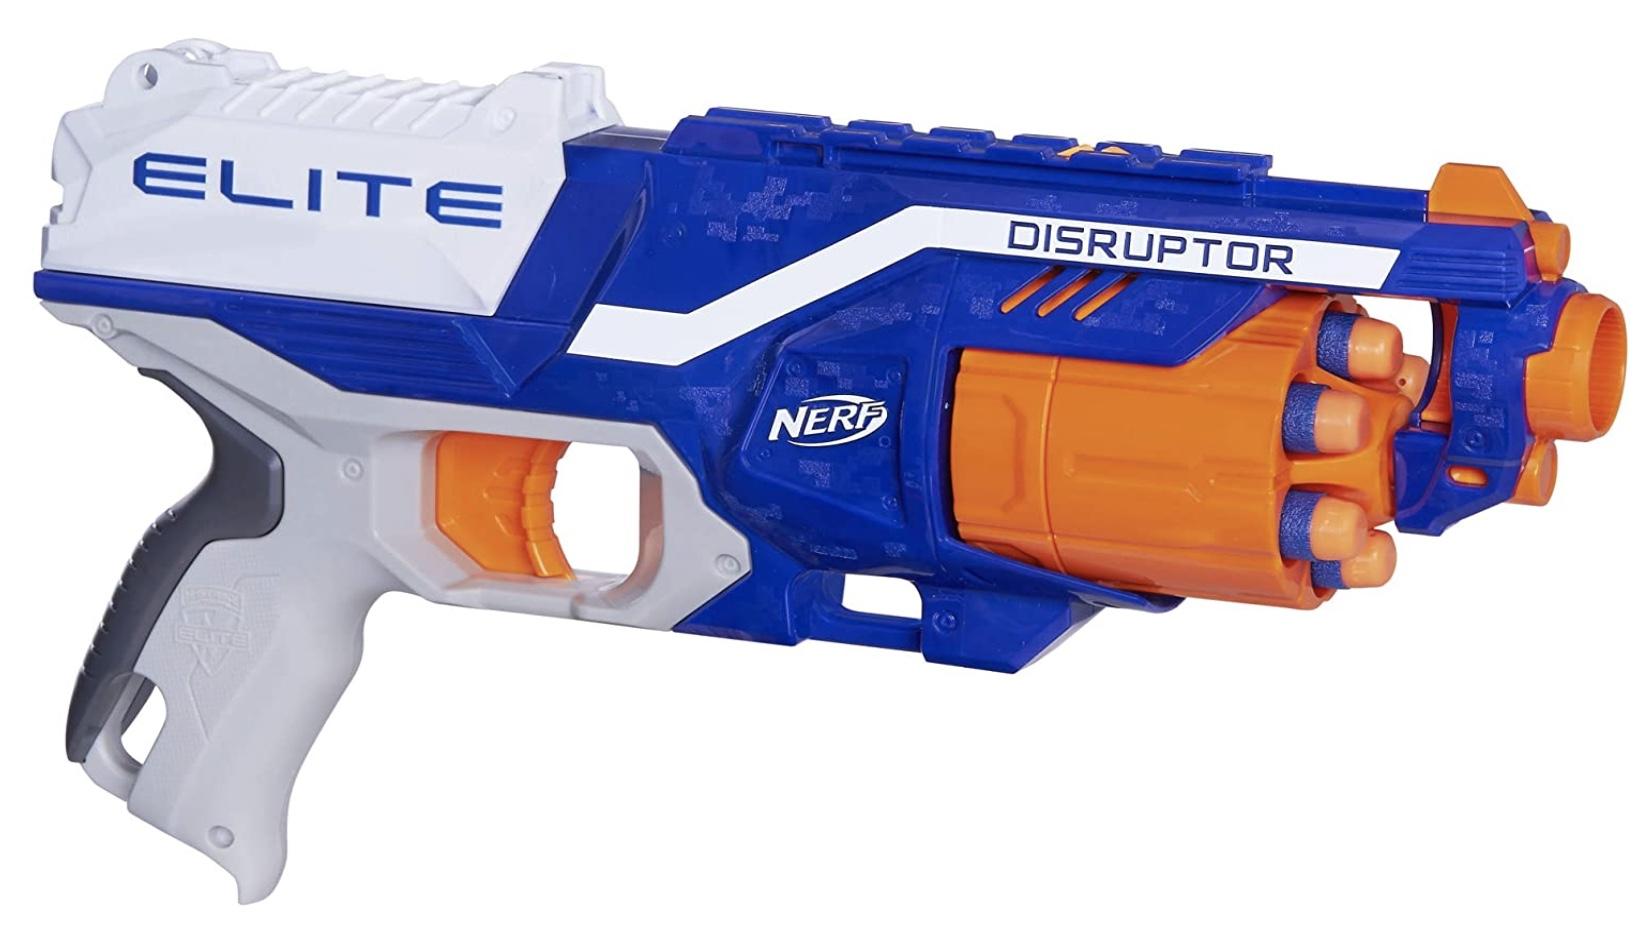 Code promo Amazon : Jeu de tirs NERF Elite Disruptor à 8,99€